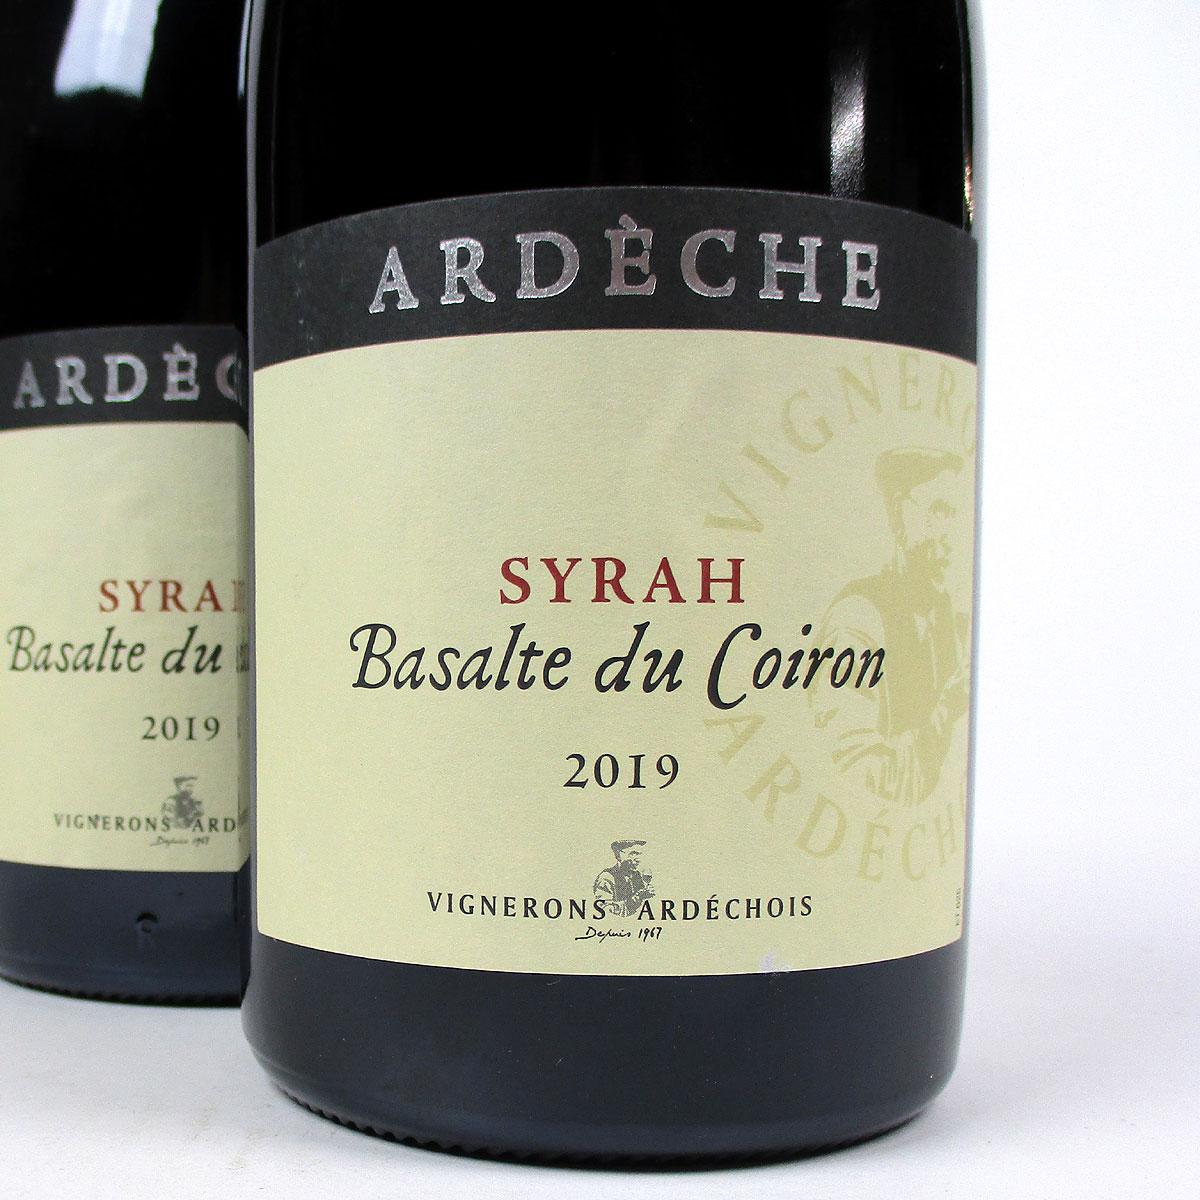 IGP Ardèche: Vignerons Ardéchois Syrah 'Basalte du Coiron' 2019